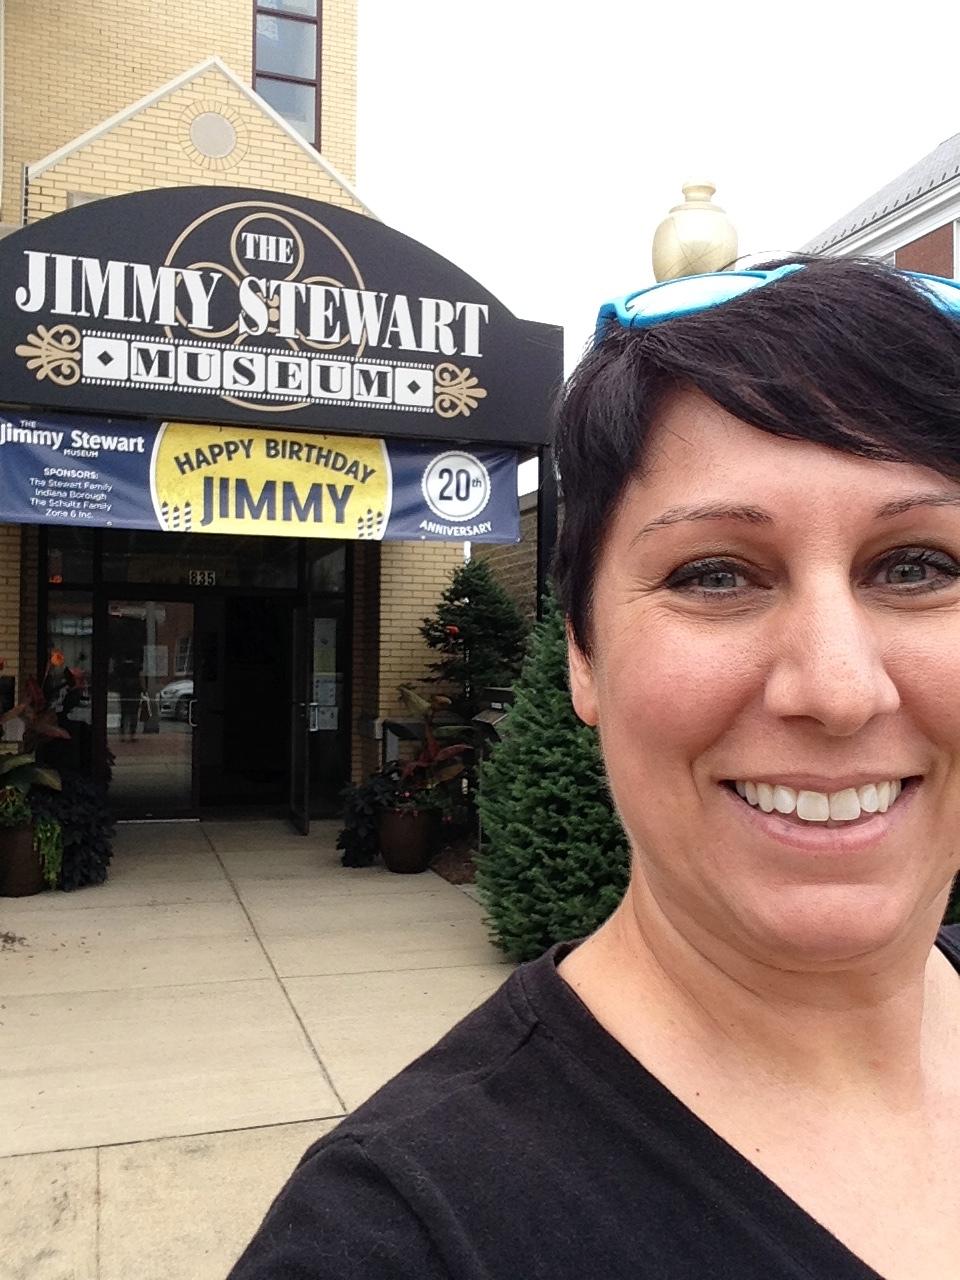 Christmas TV History: Jimmy Stewart Museum